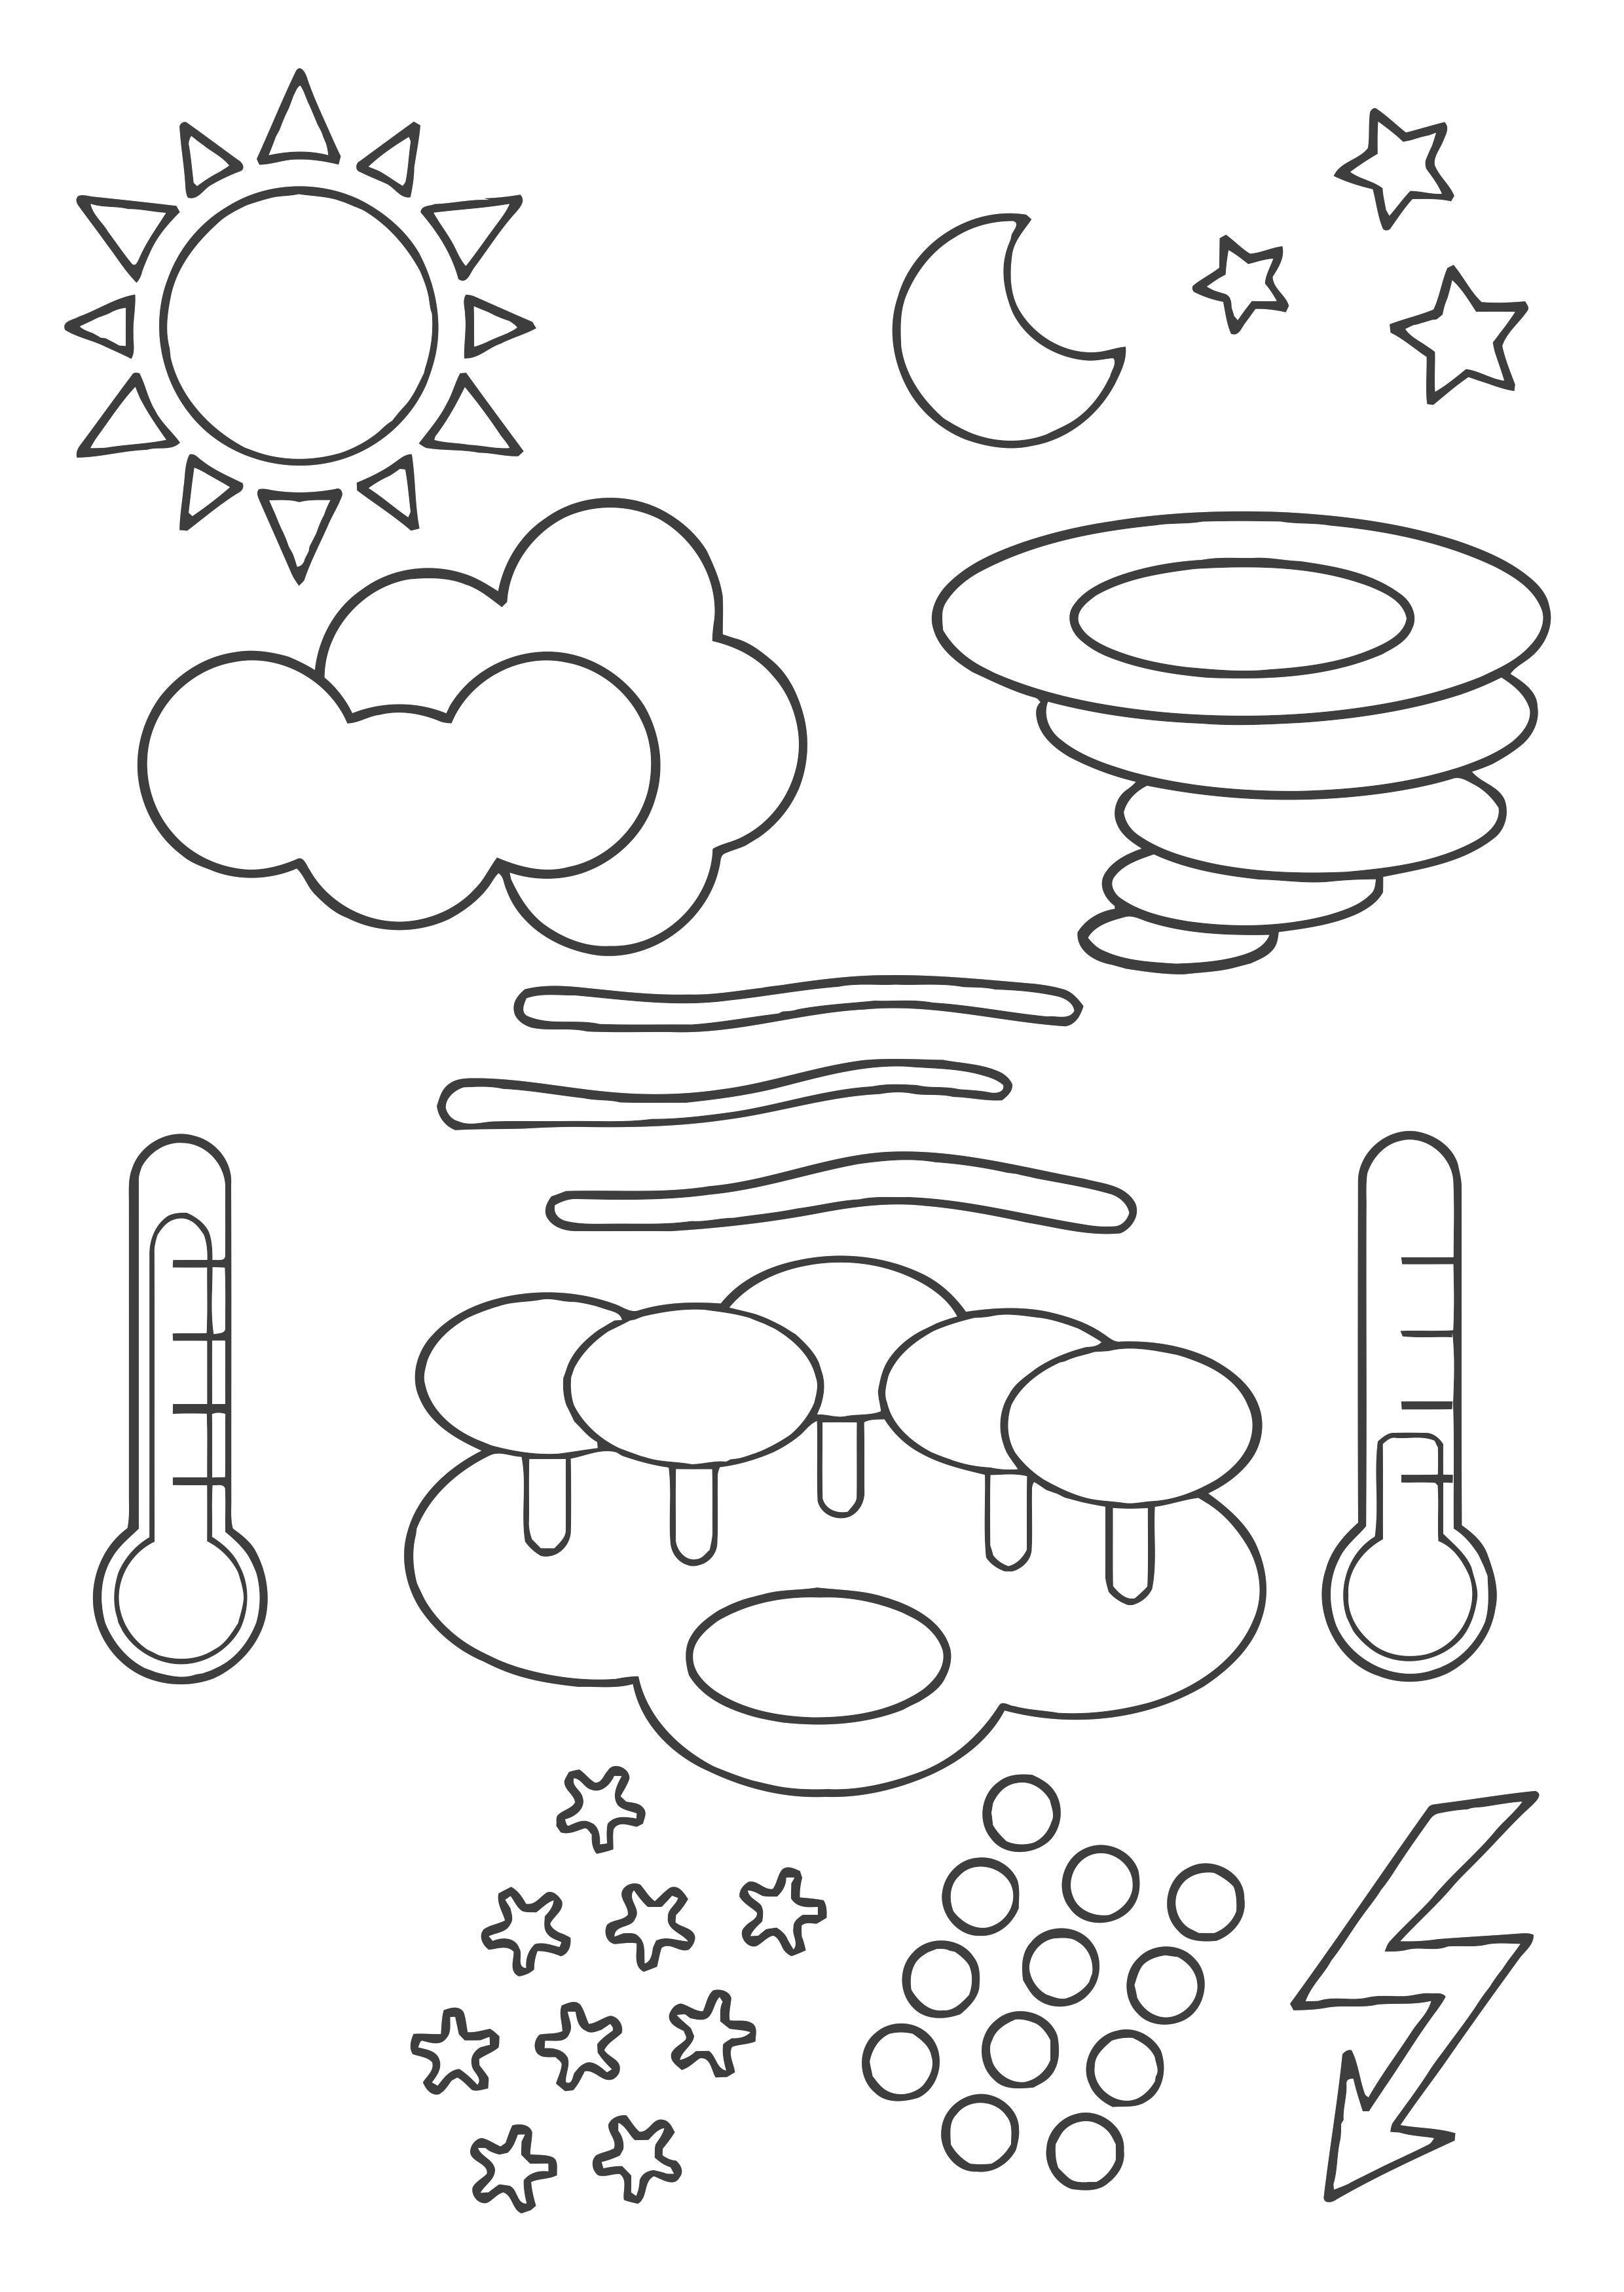 i giorni della settimana da colorare auto electrical wiring diagram Polaris ATV Wiring Diagram kleurplaat weer symbolen